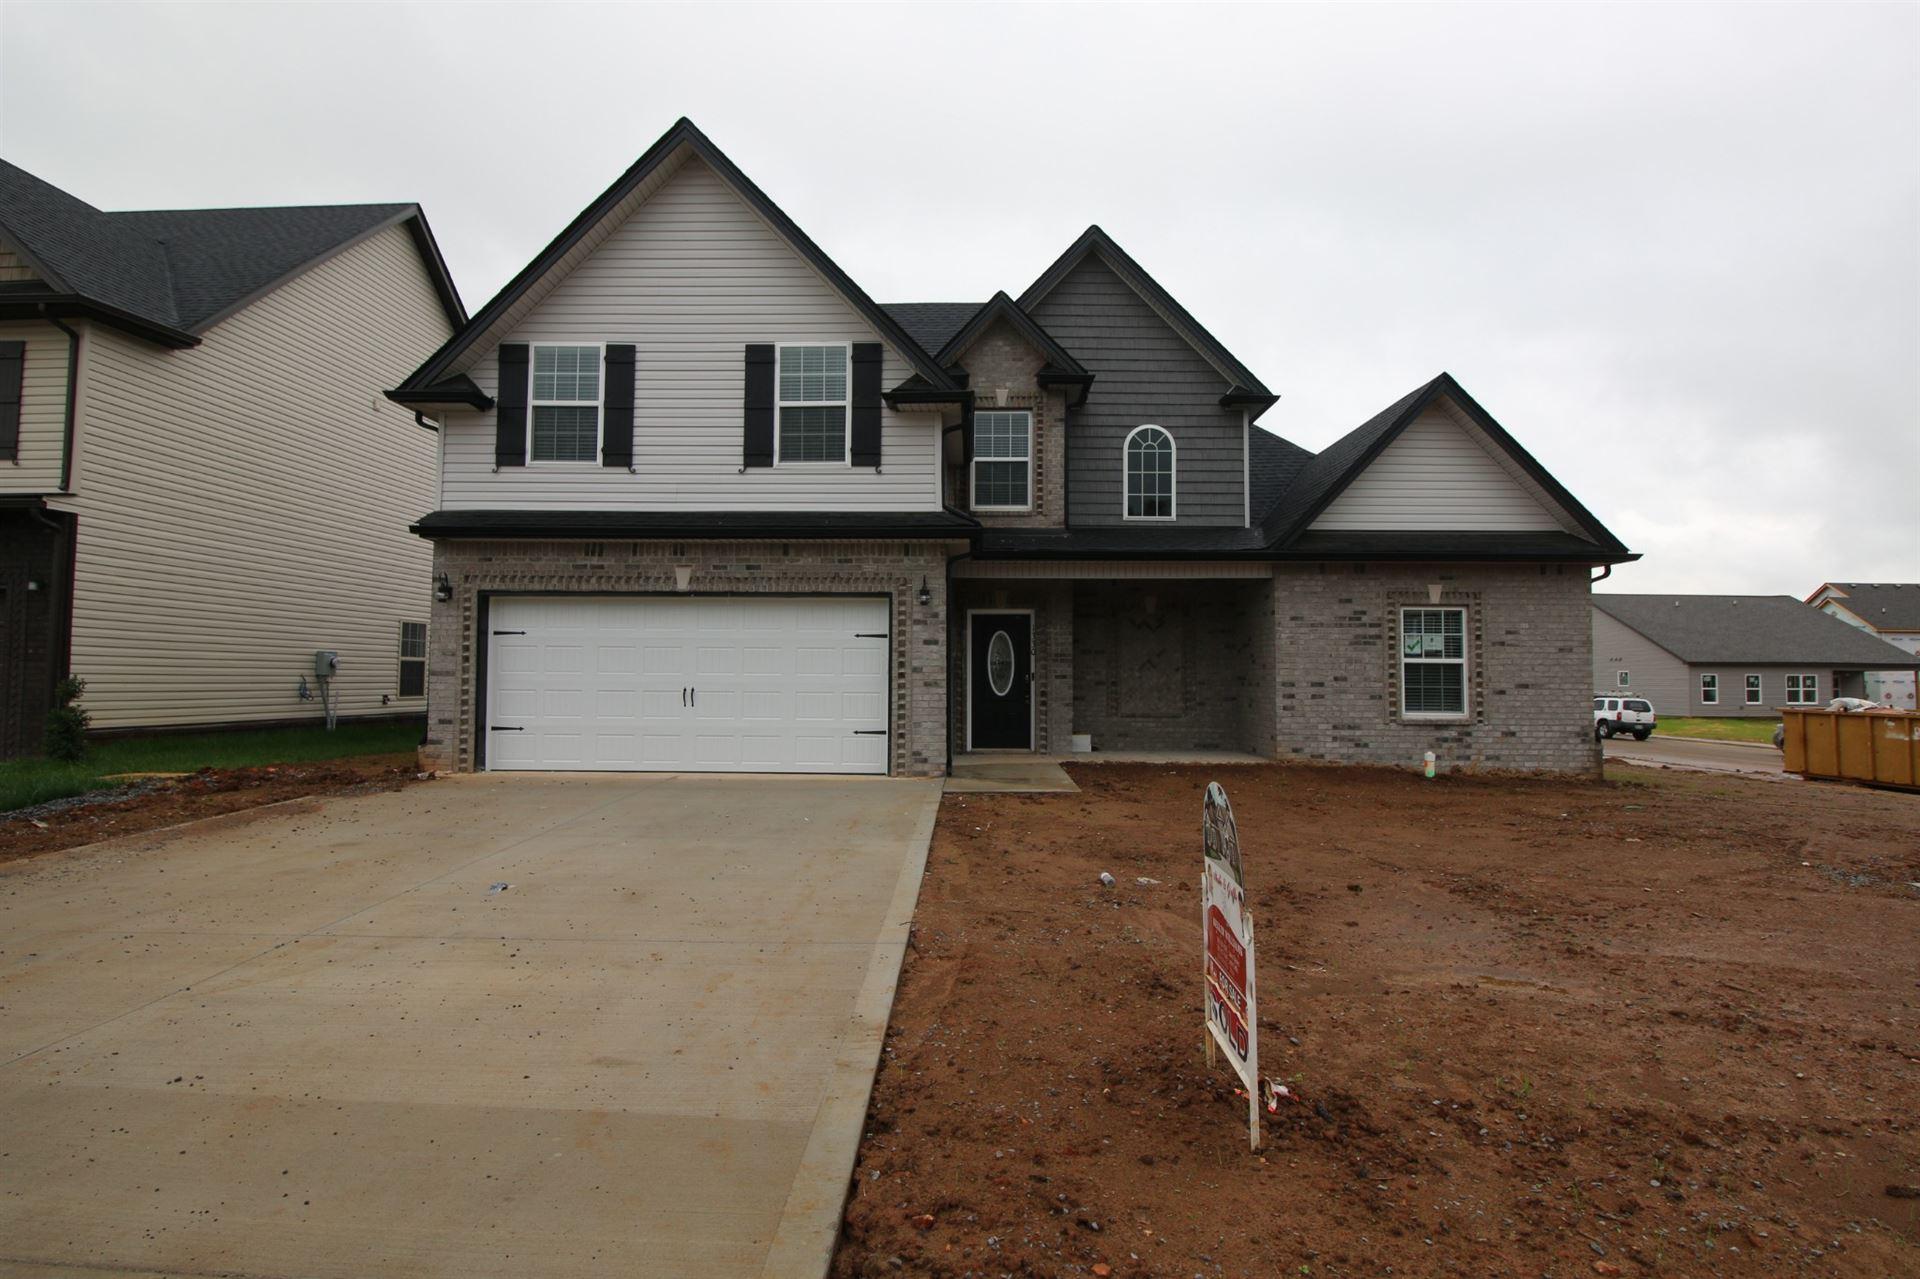 8 Mills Creek, Clarksville, TN 37042 - MLS#: 2240306